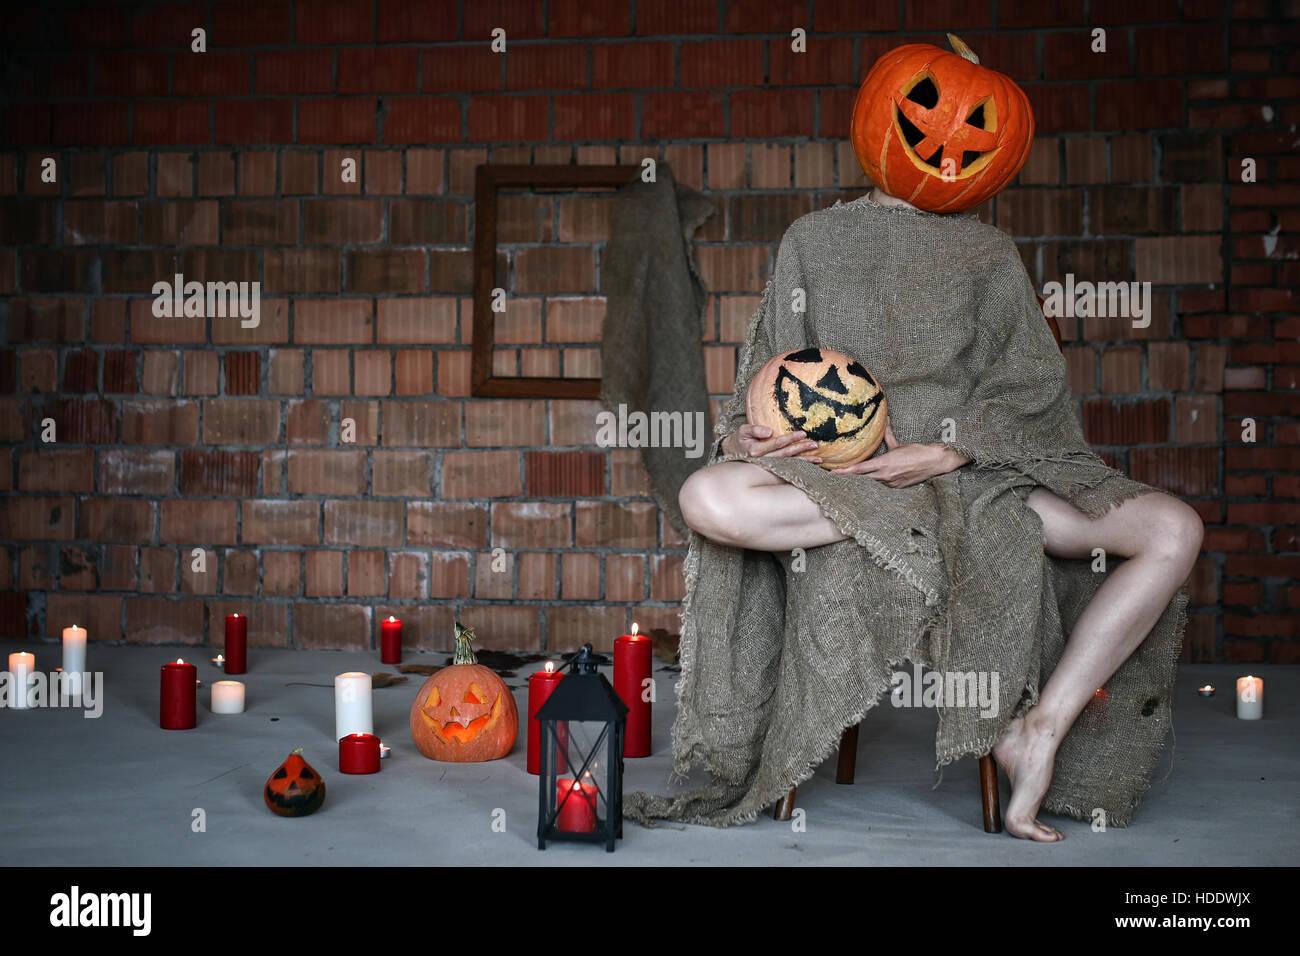 halloween decoration scary house stock photos & halloween decoration